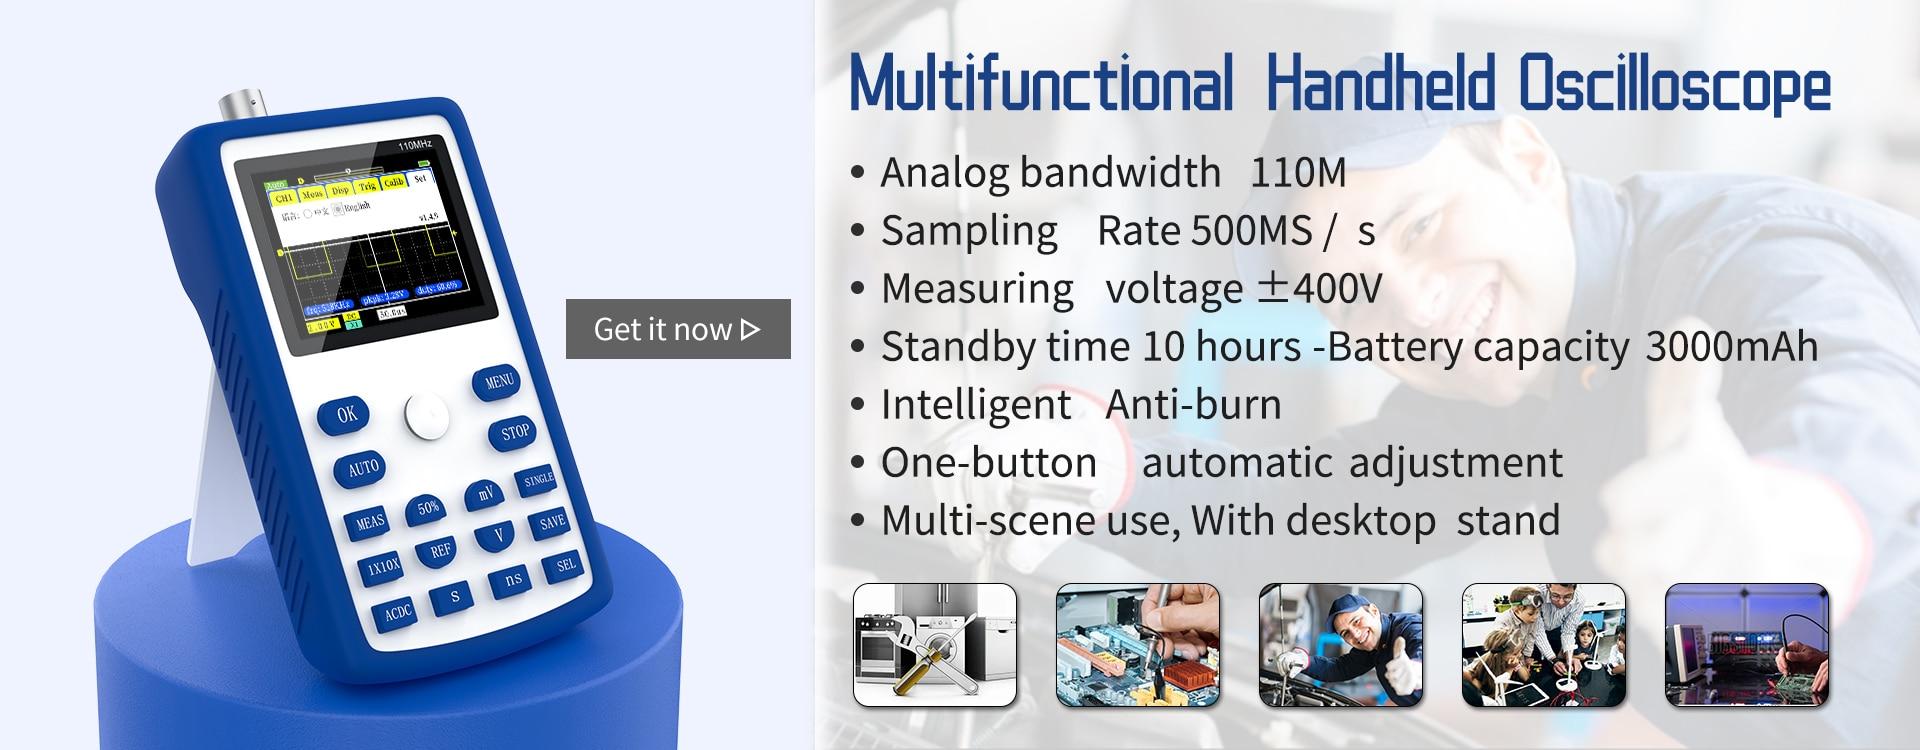 Fafeicy Digitales Oszilloskop DIY-Handheld-DSO FNIRSI-150 15001K 0-200 KHz 5 mV//Div-20 mV//IDV mit einem 2,4-Zoll-Farb-TFT-Bildschirm